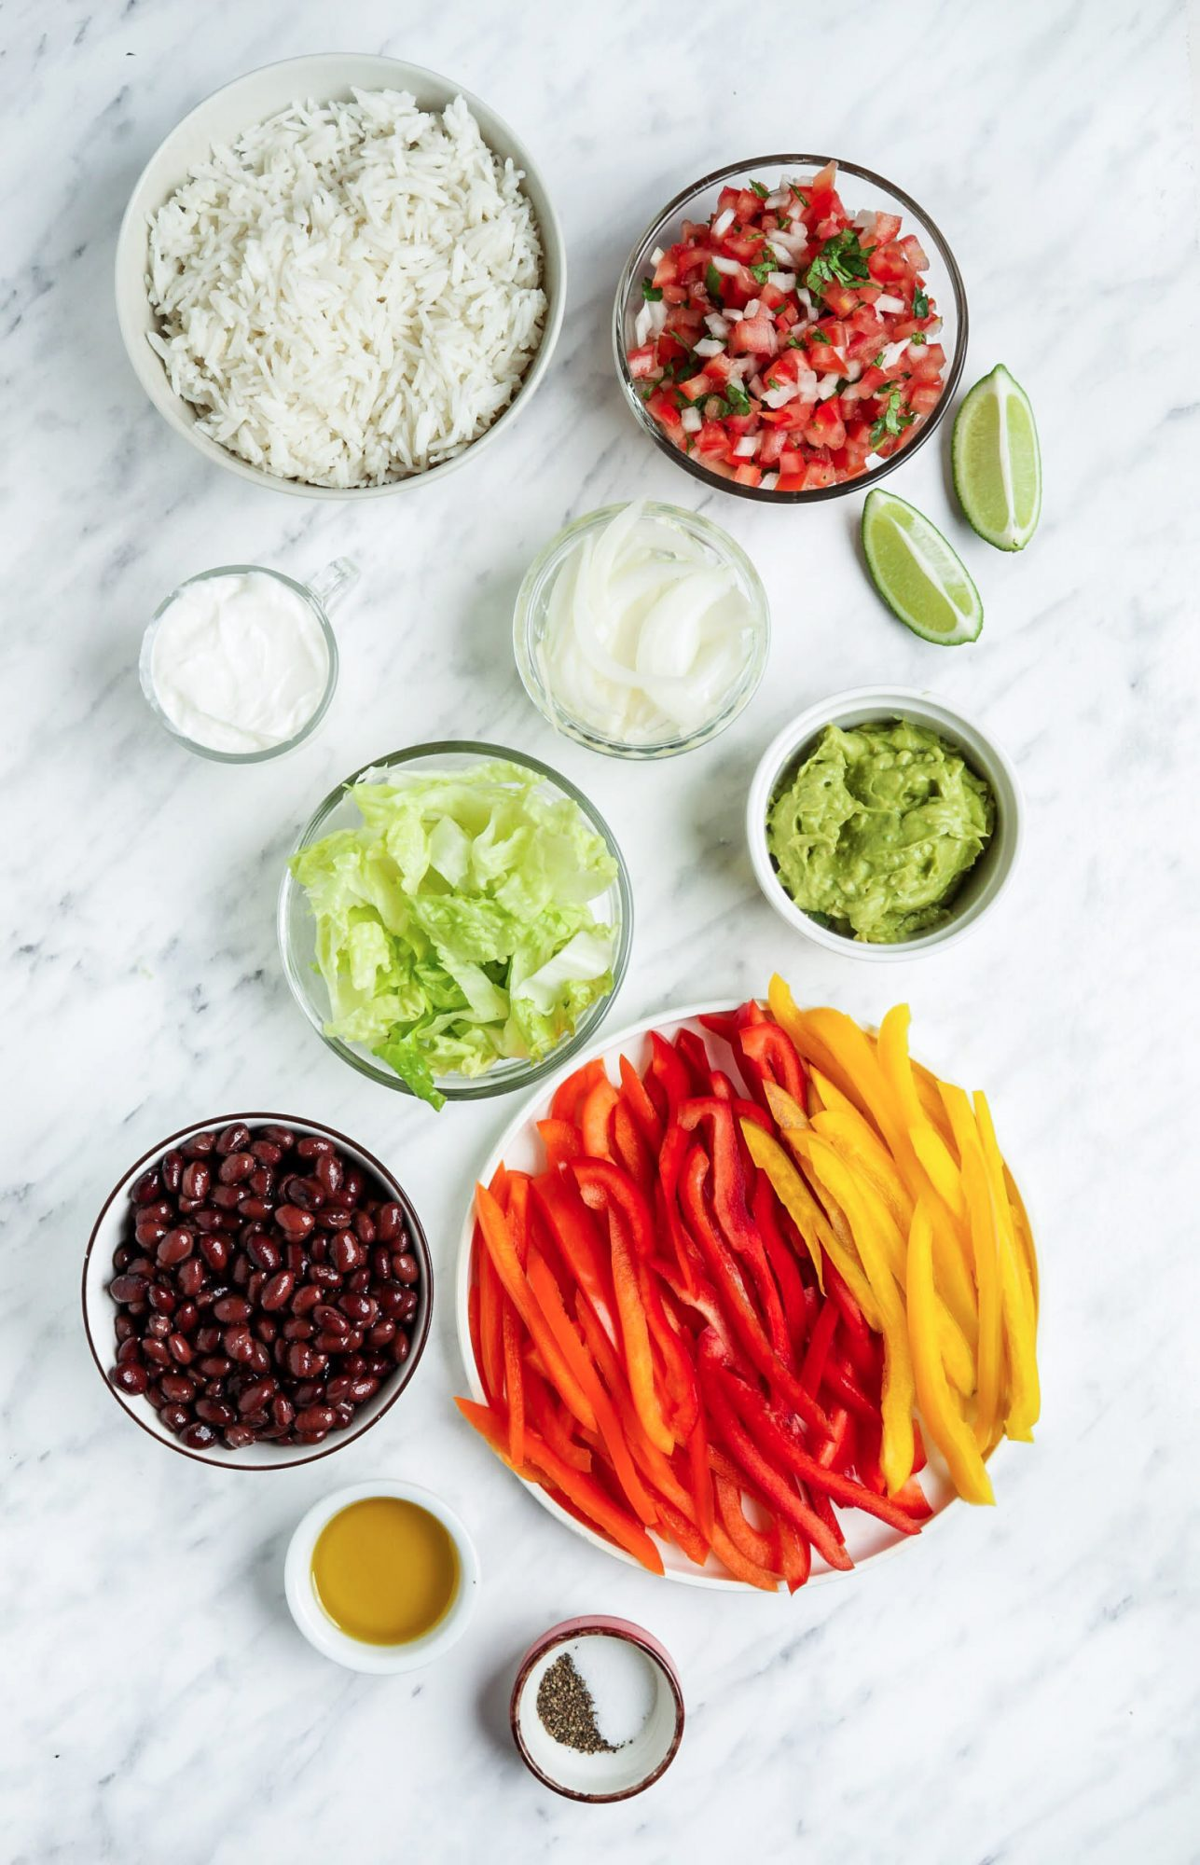 Burrito Bowl Ingredients